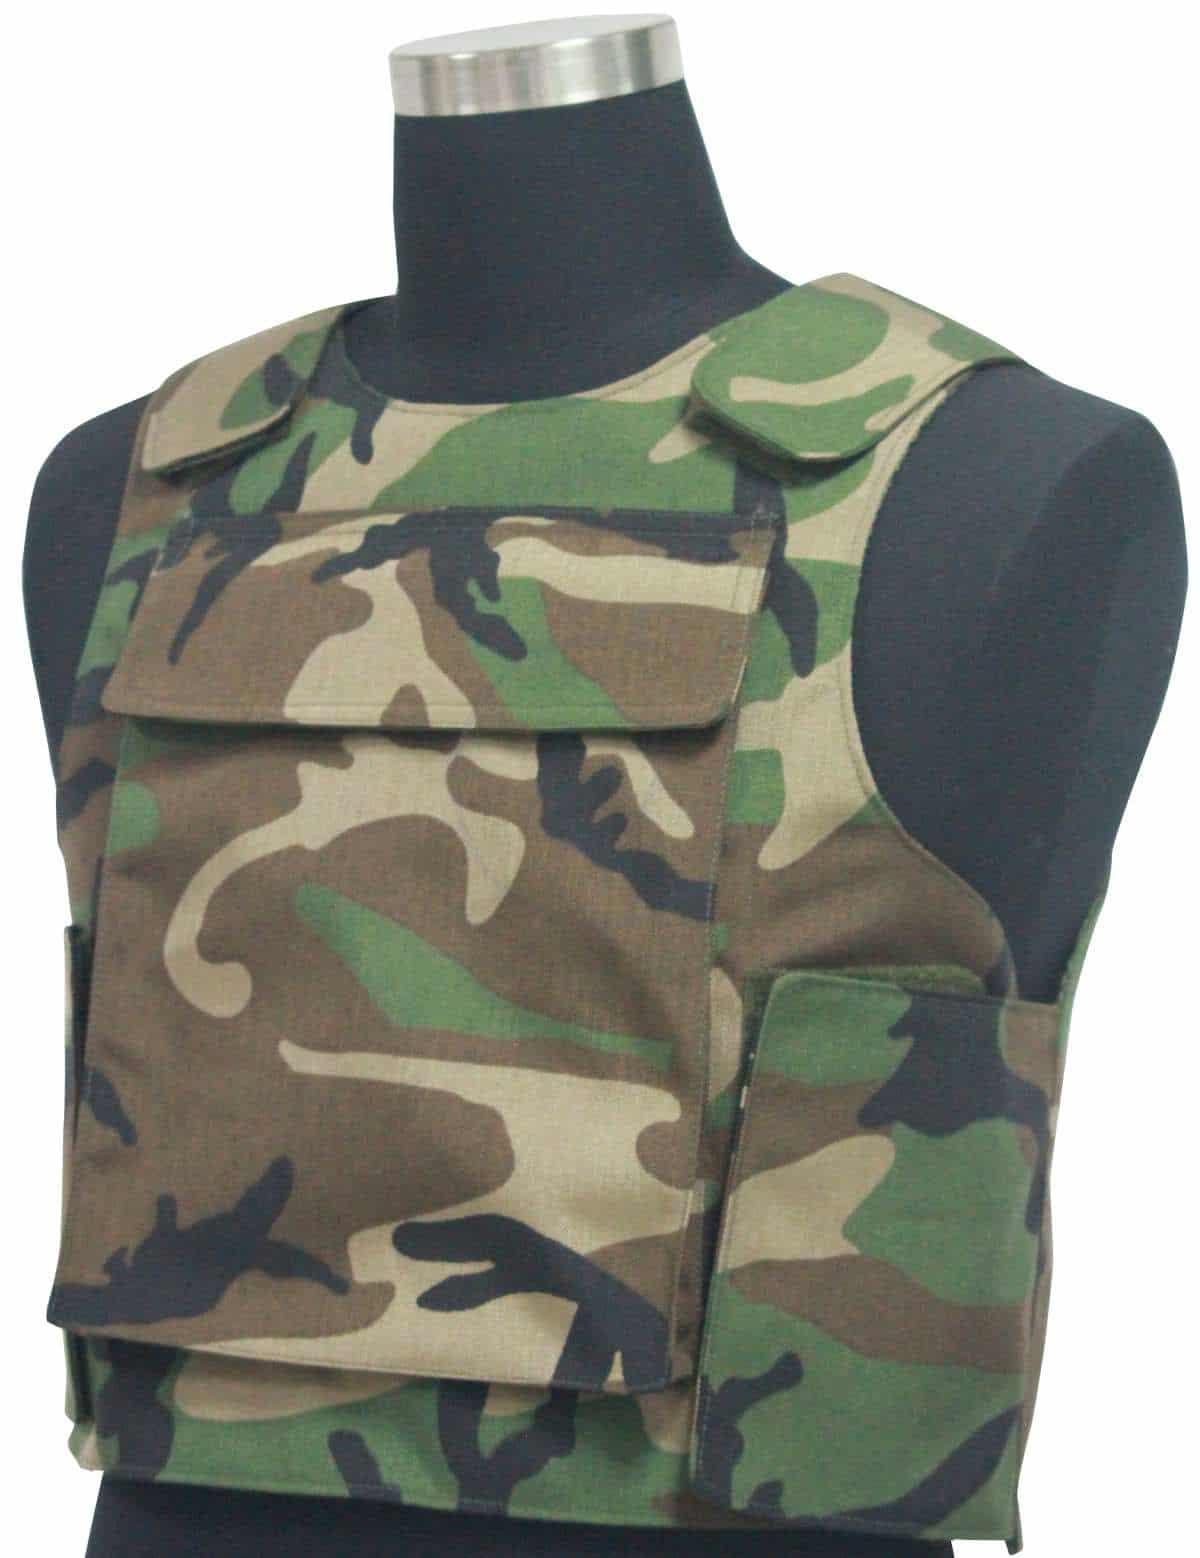 Tactical Vest Plate Carrier (80)